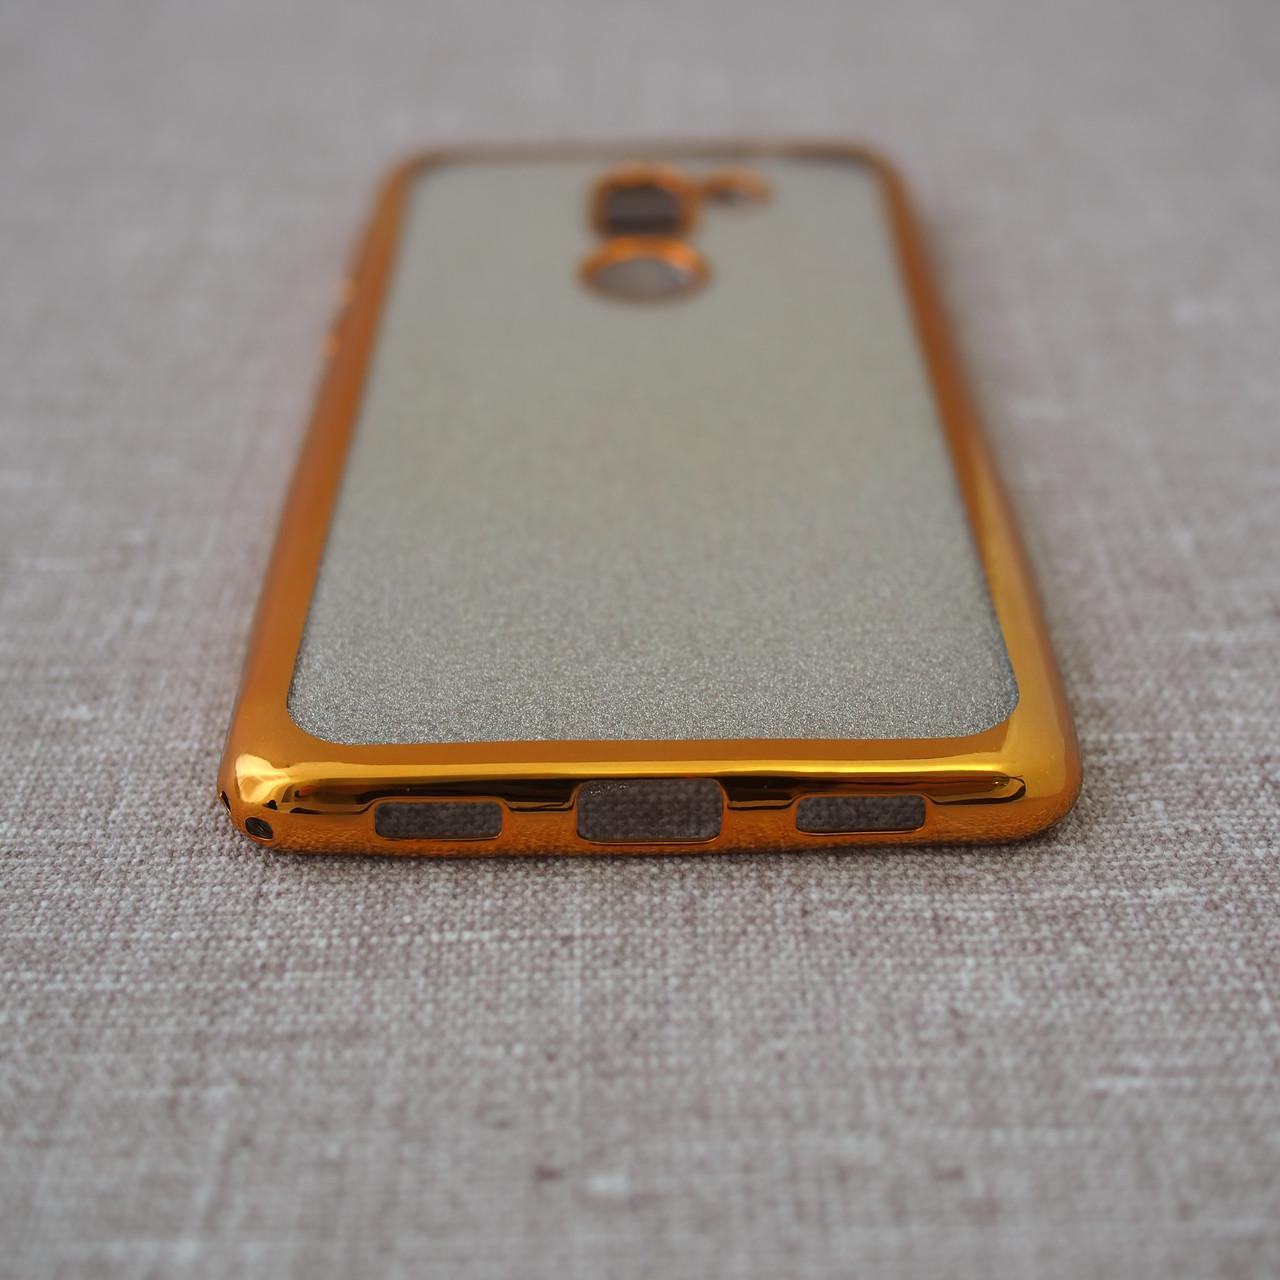 Remax Glitter Air Huawei GR5 2017 gold Для телефона